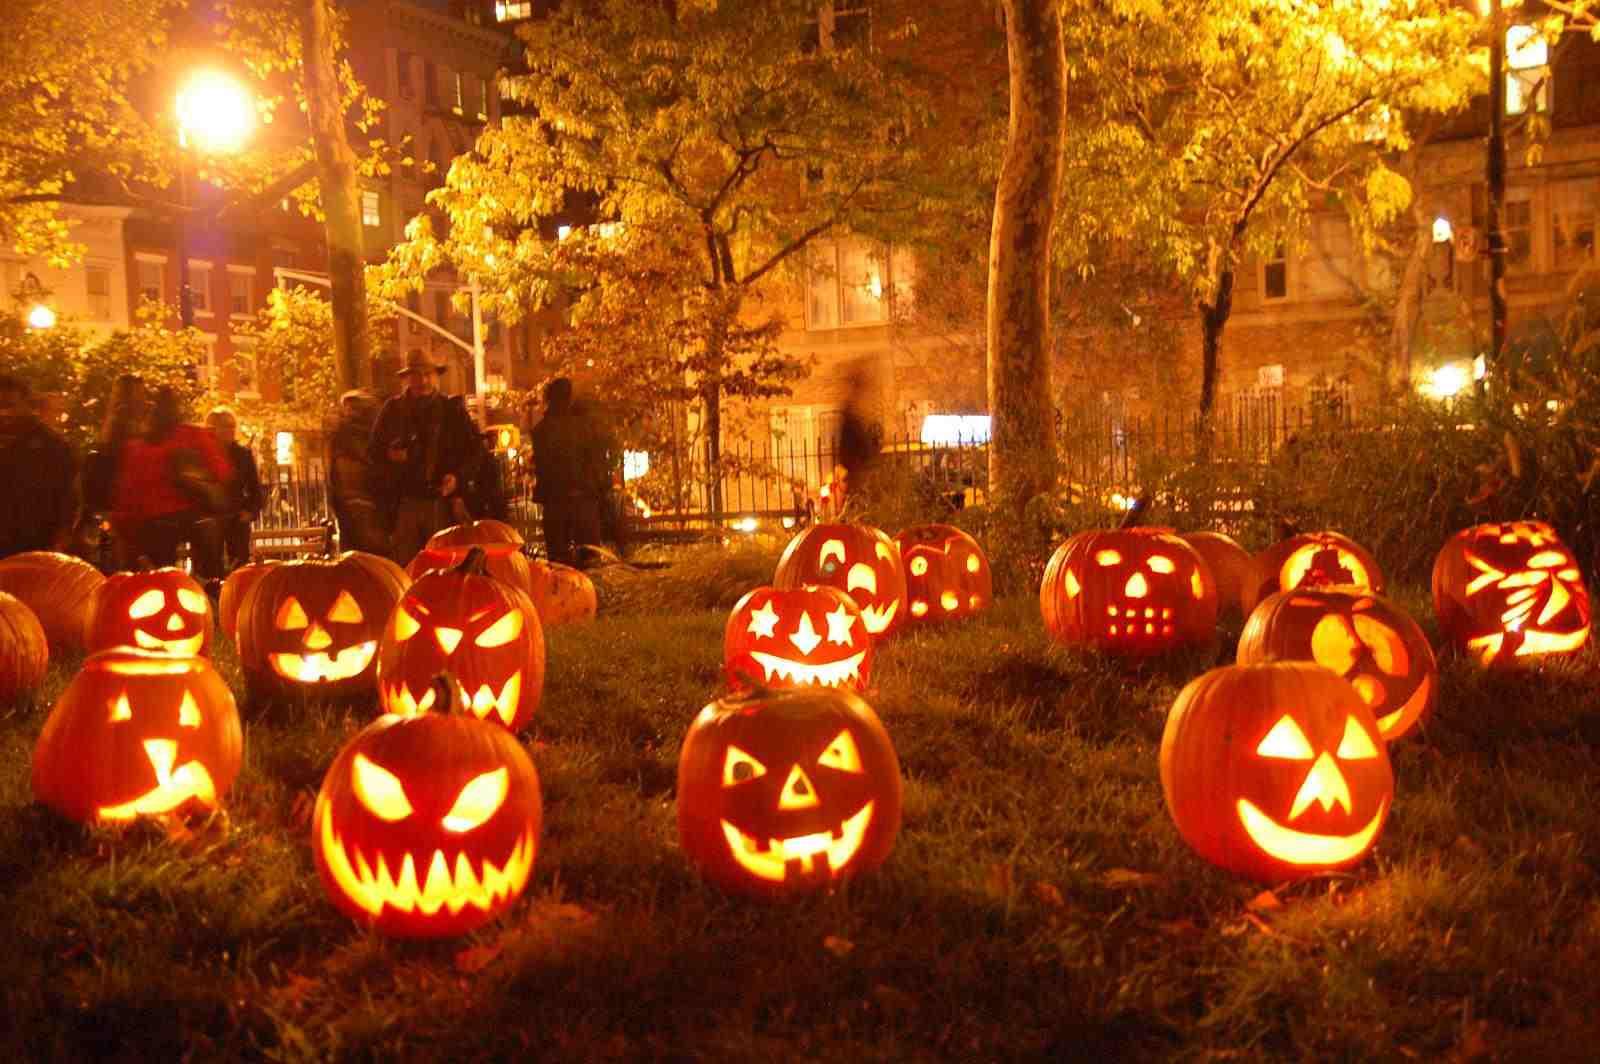 A Candle Halloween Pumkin 2020